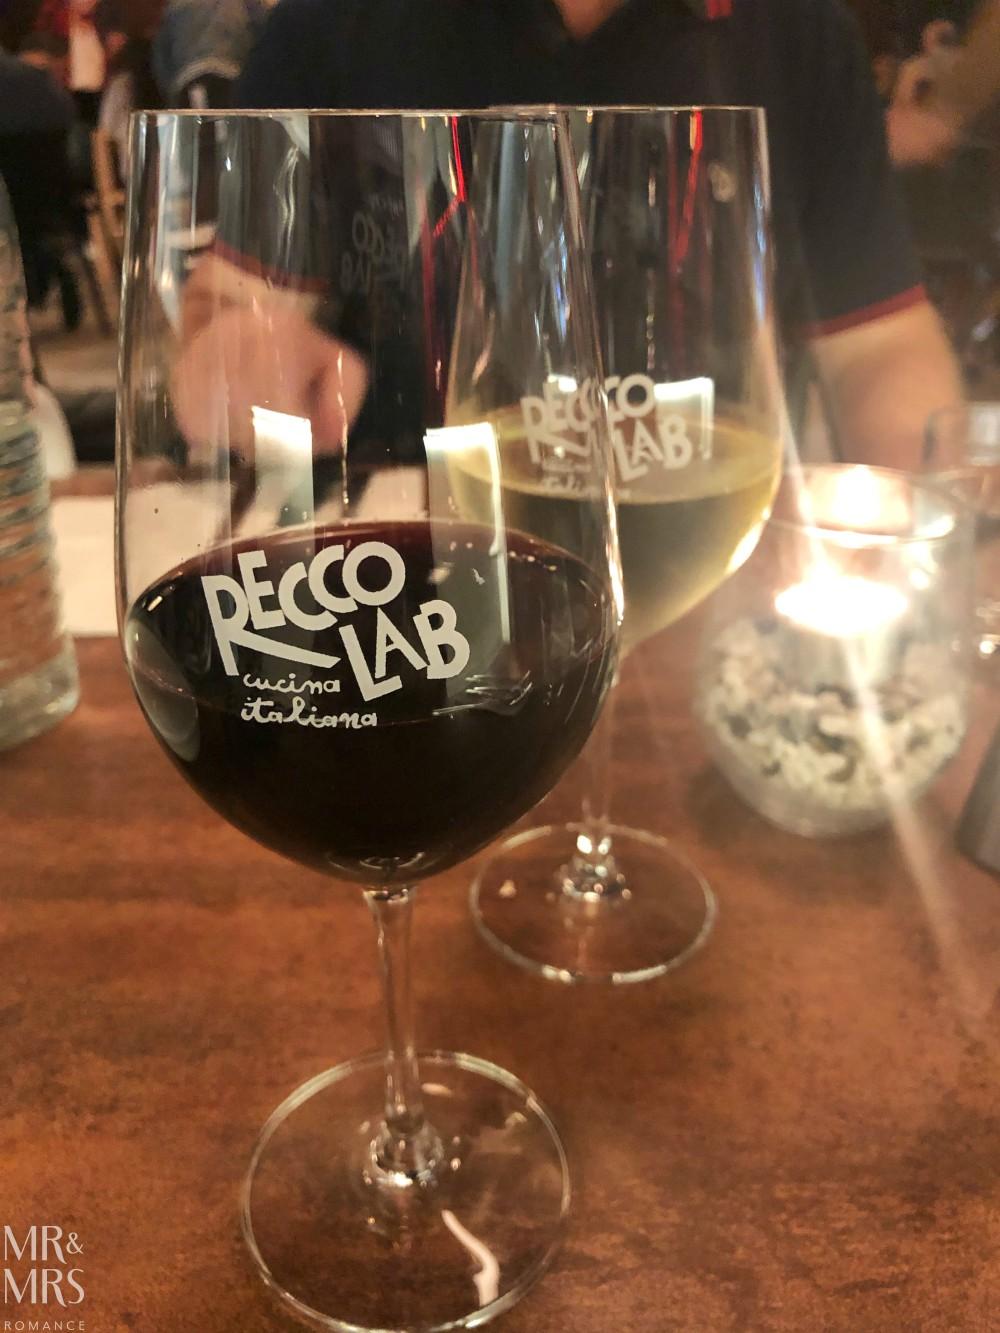 ReccoLab, Rozelle - northwestern Italian restaurant